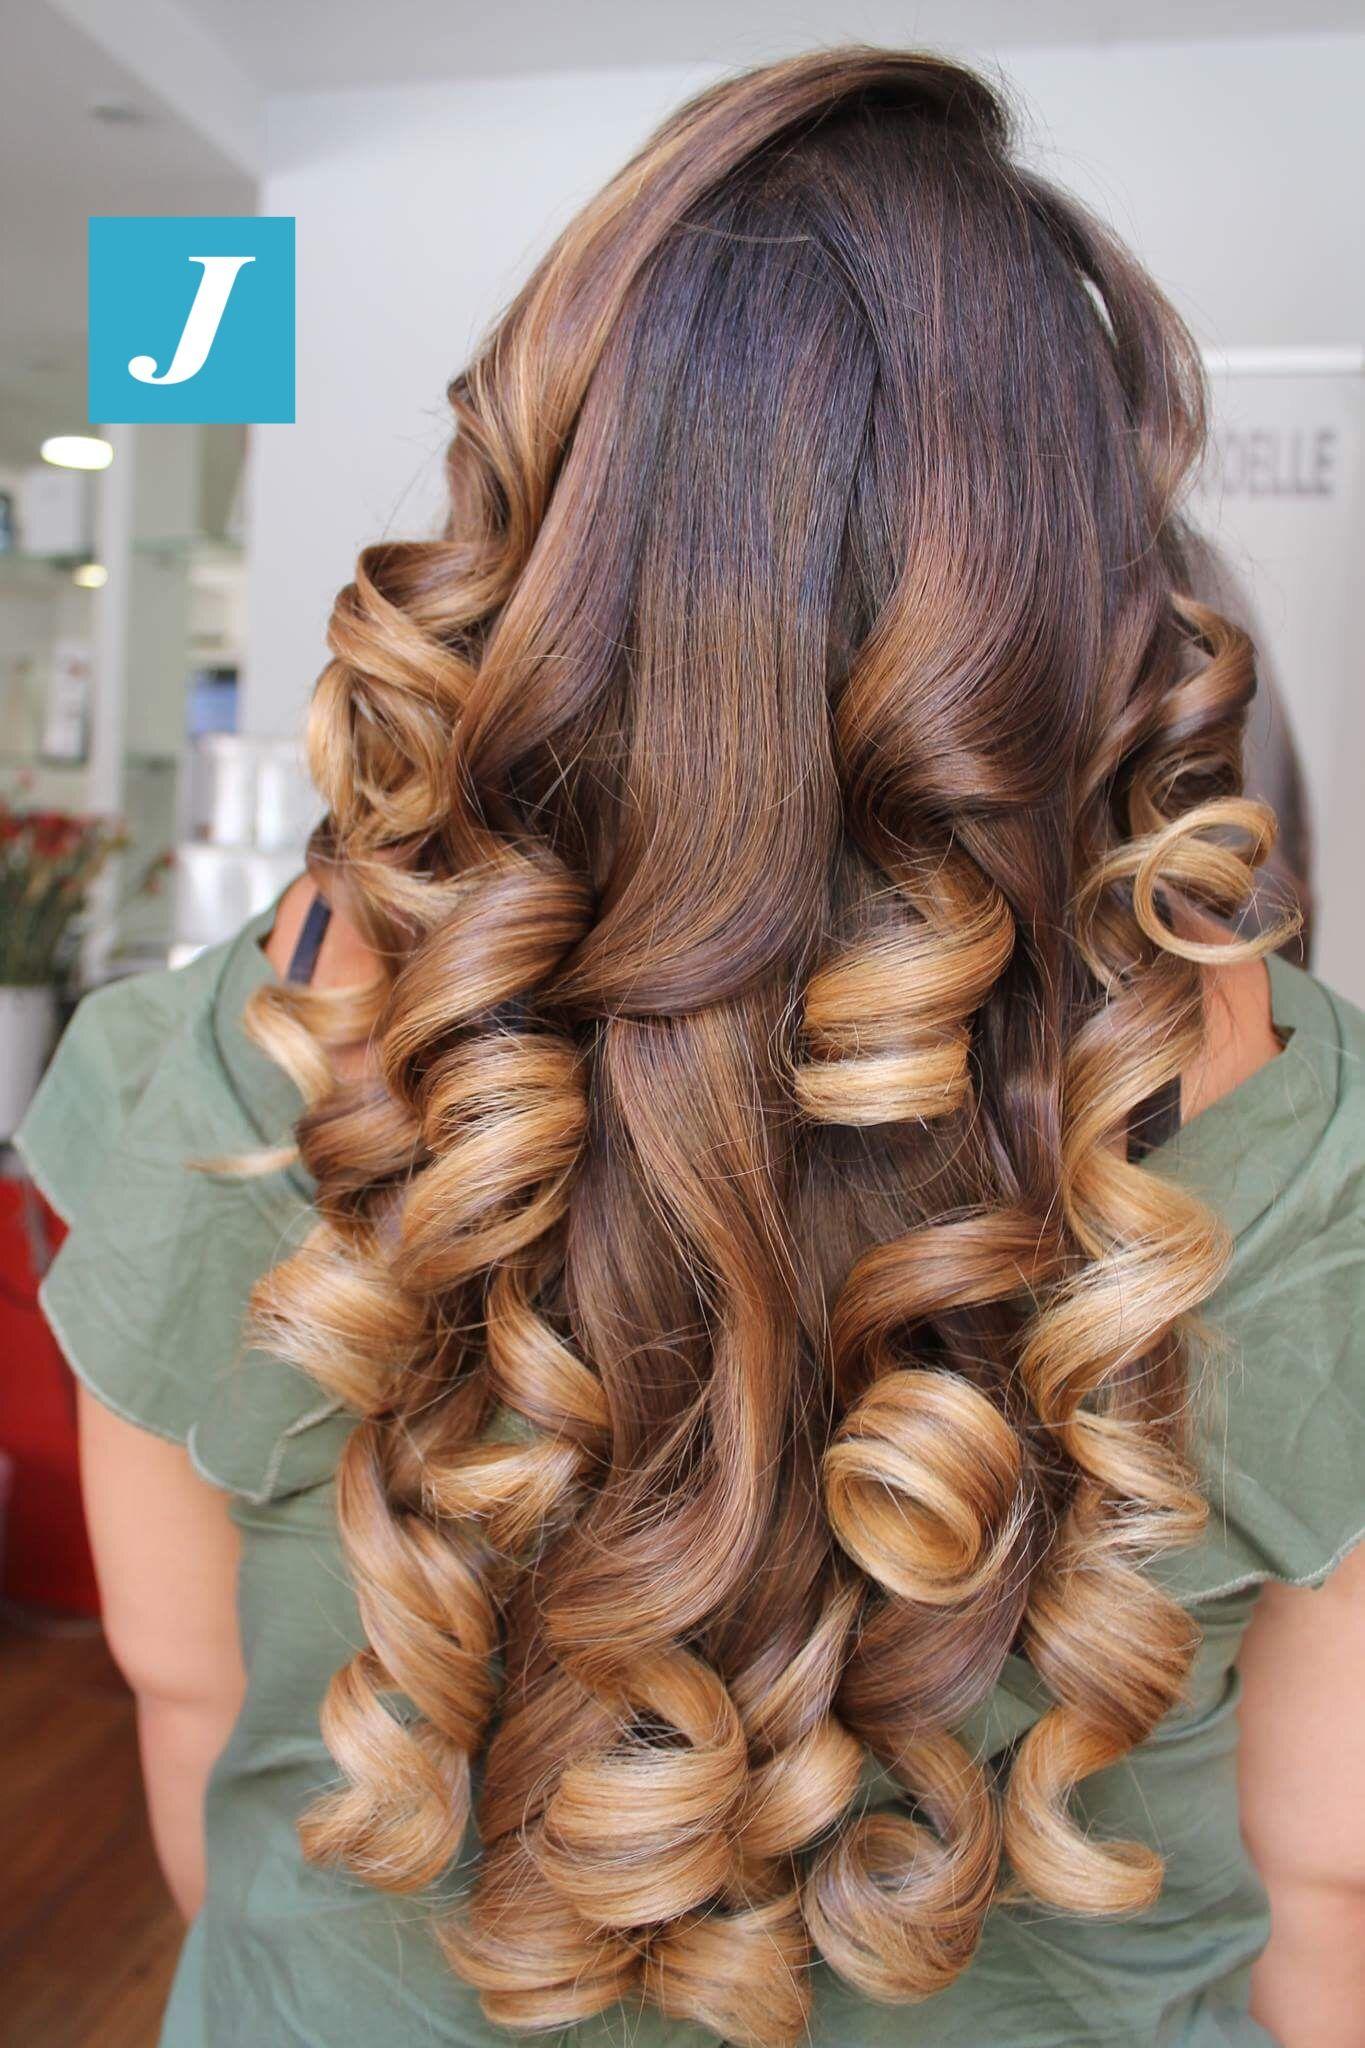 Pin by a mac on Long hair | Hair, Curly hair styles, Long ...